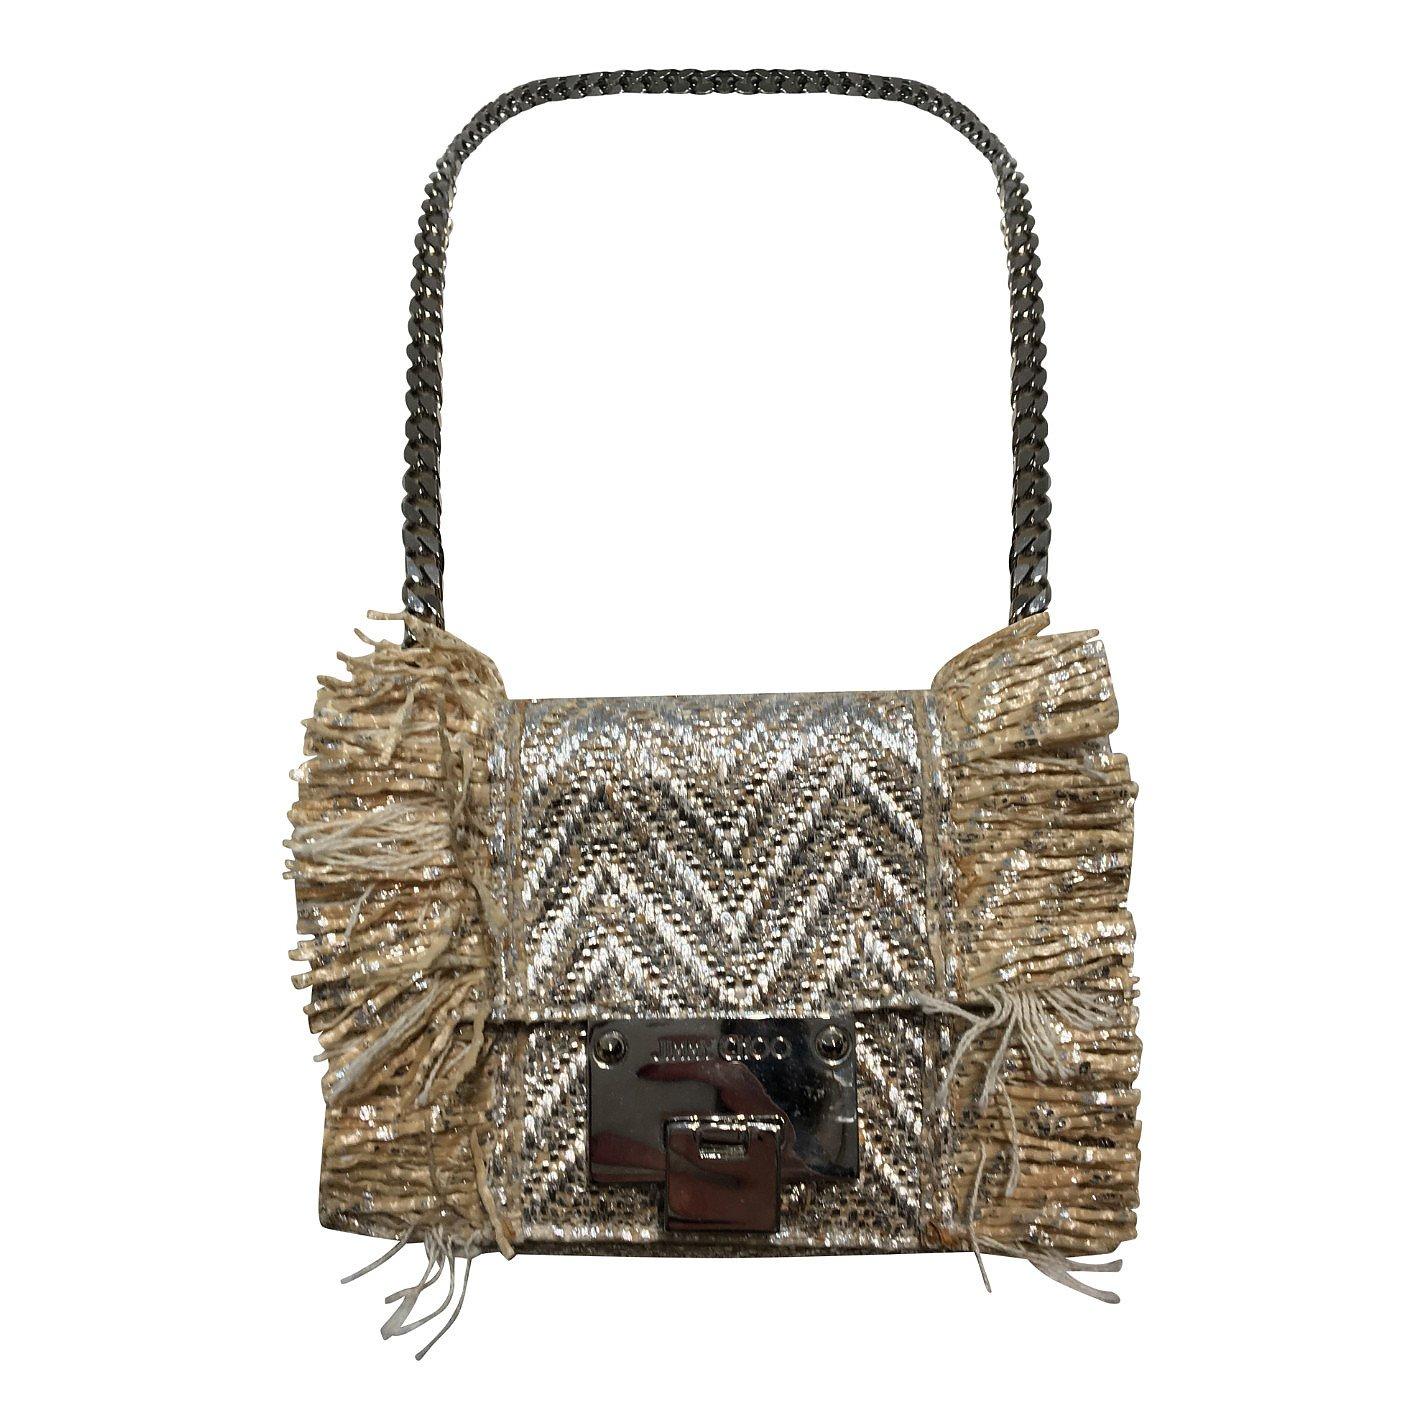 Jimmy Choo Metallic Straw-Trimmed Bag